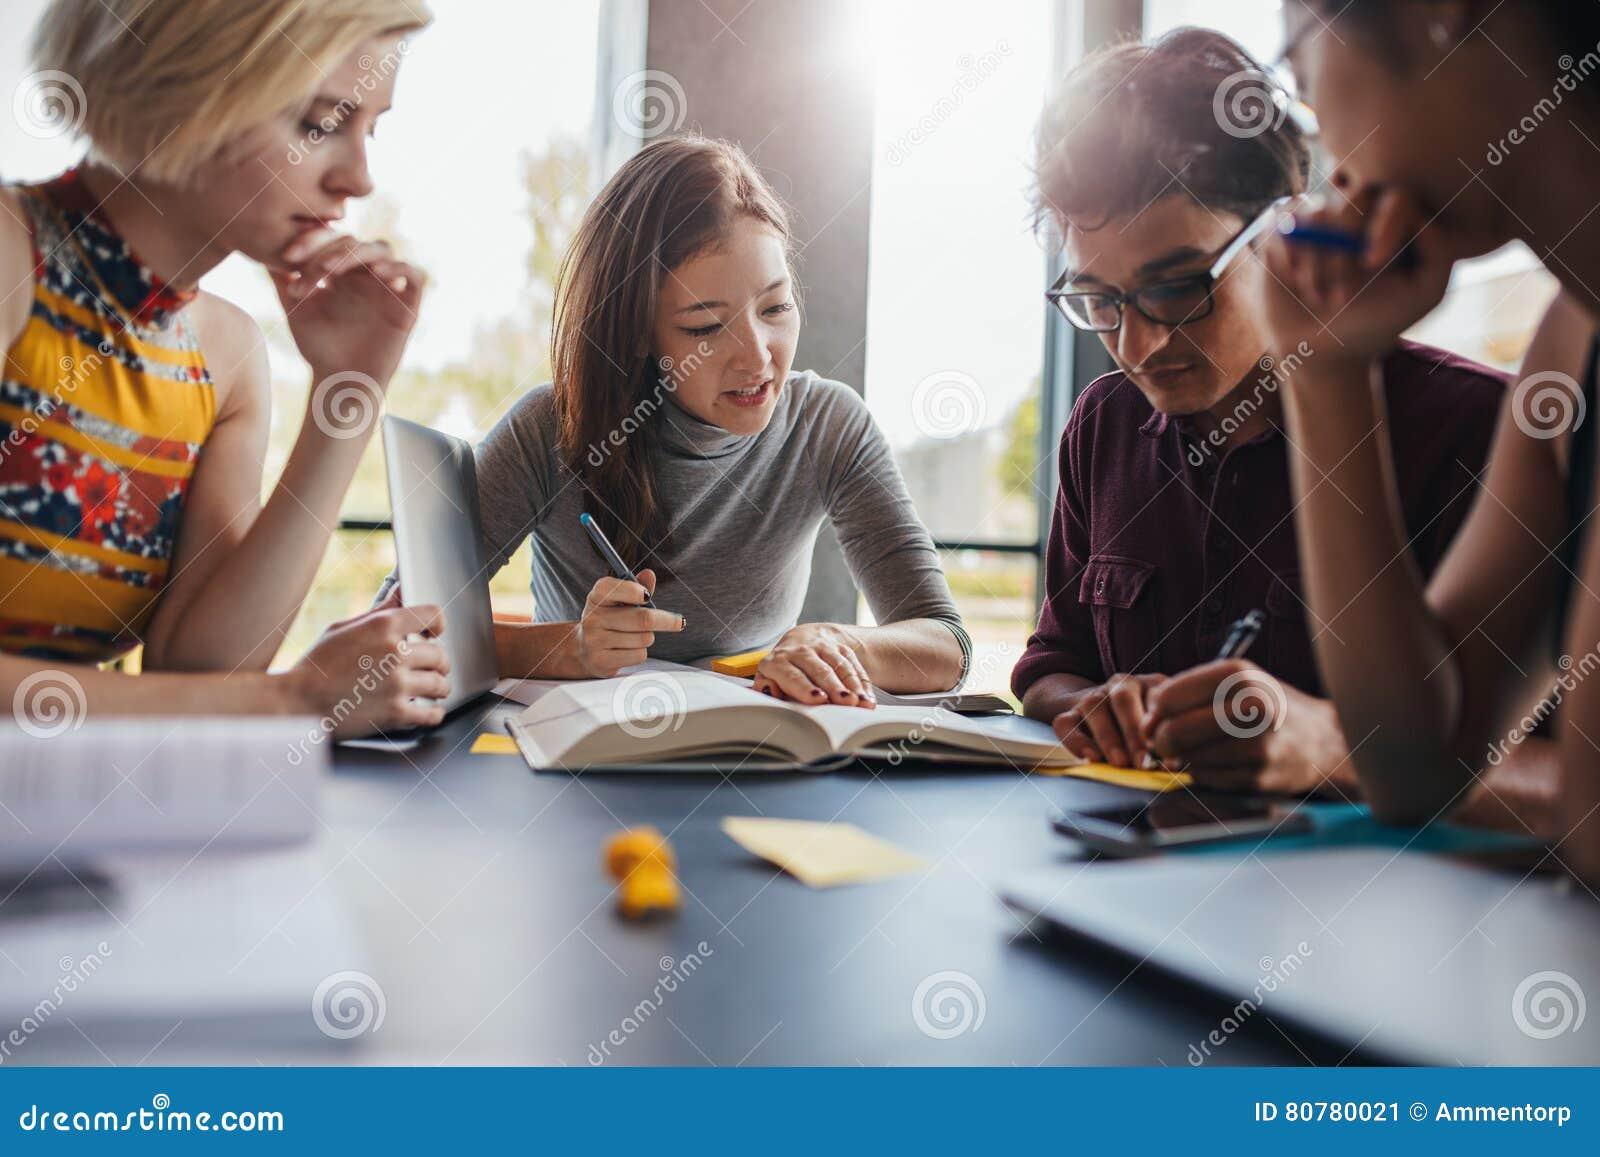 Grupp av studenter som gör skolauppgift